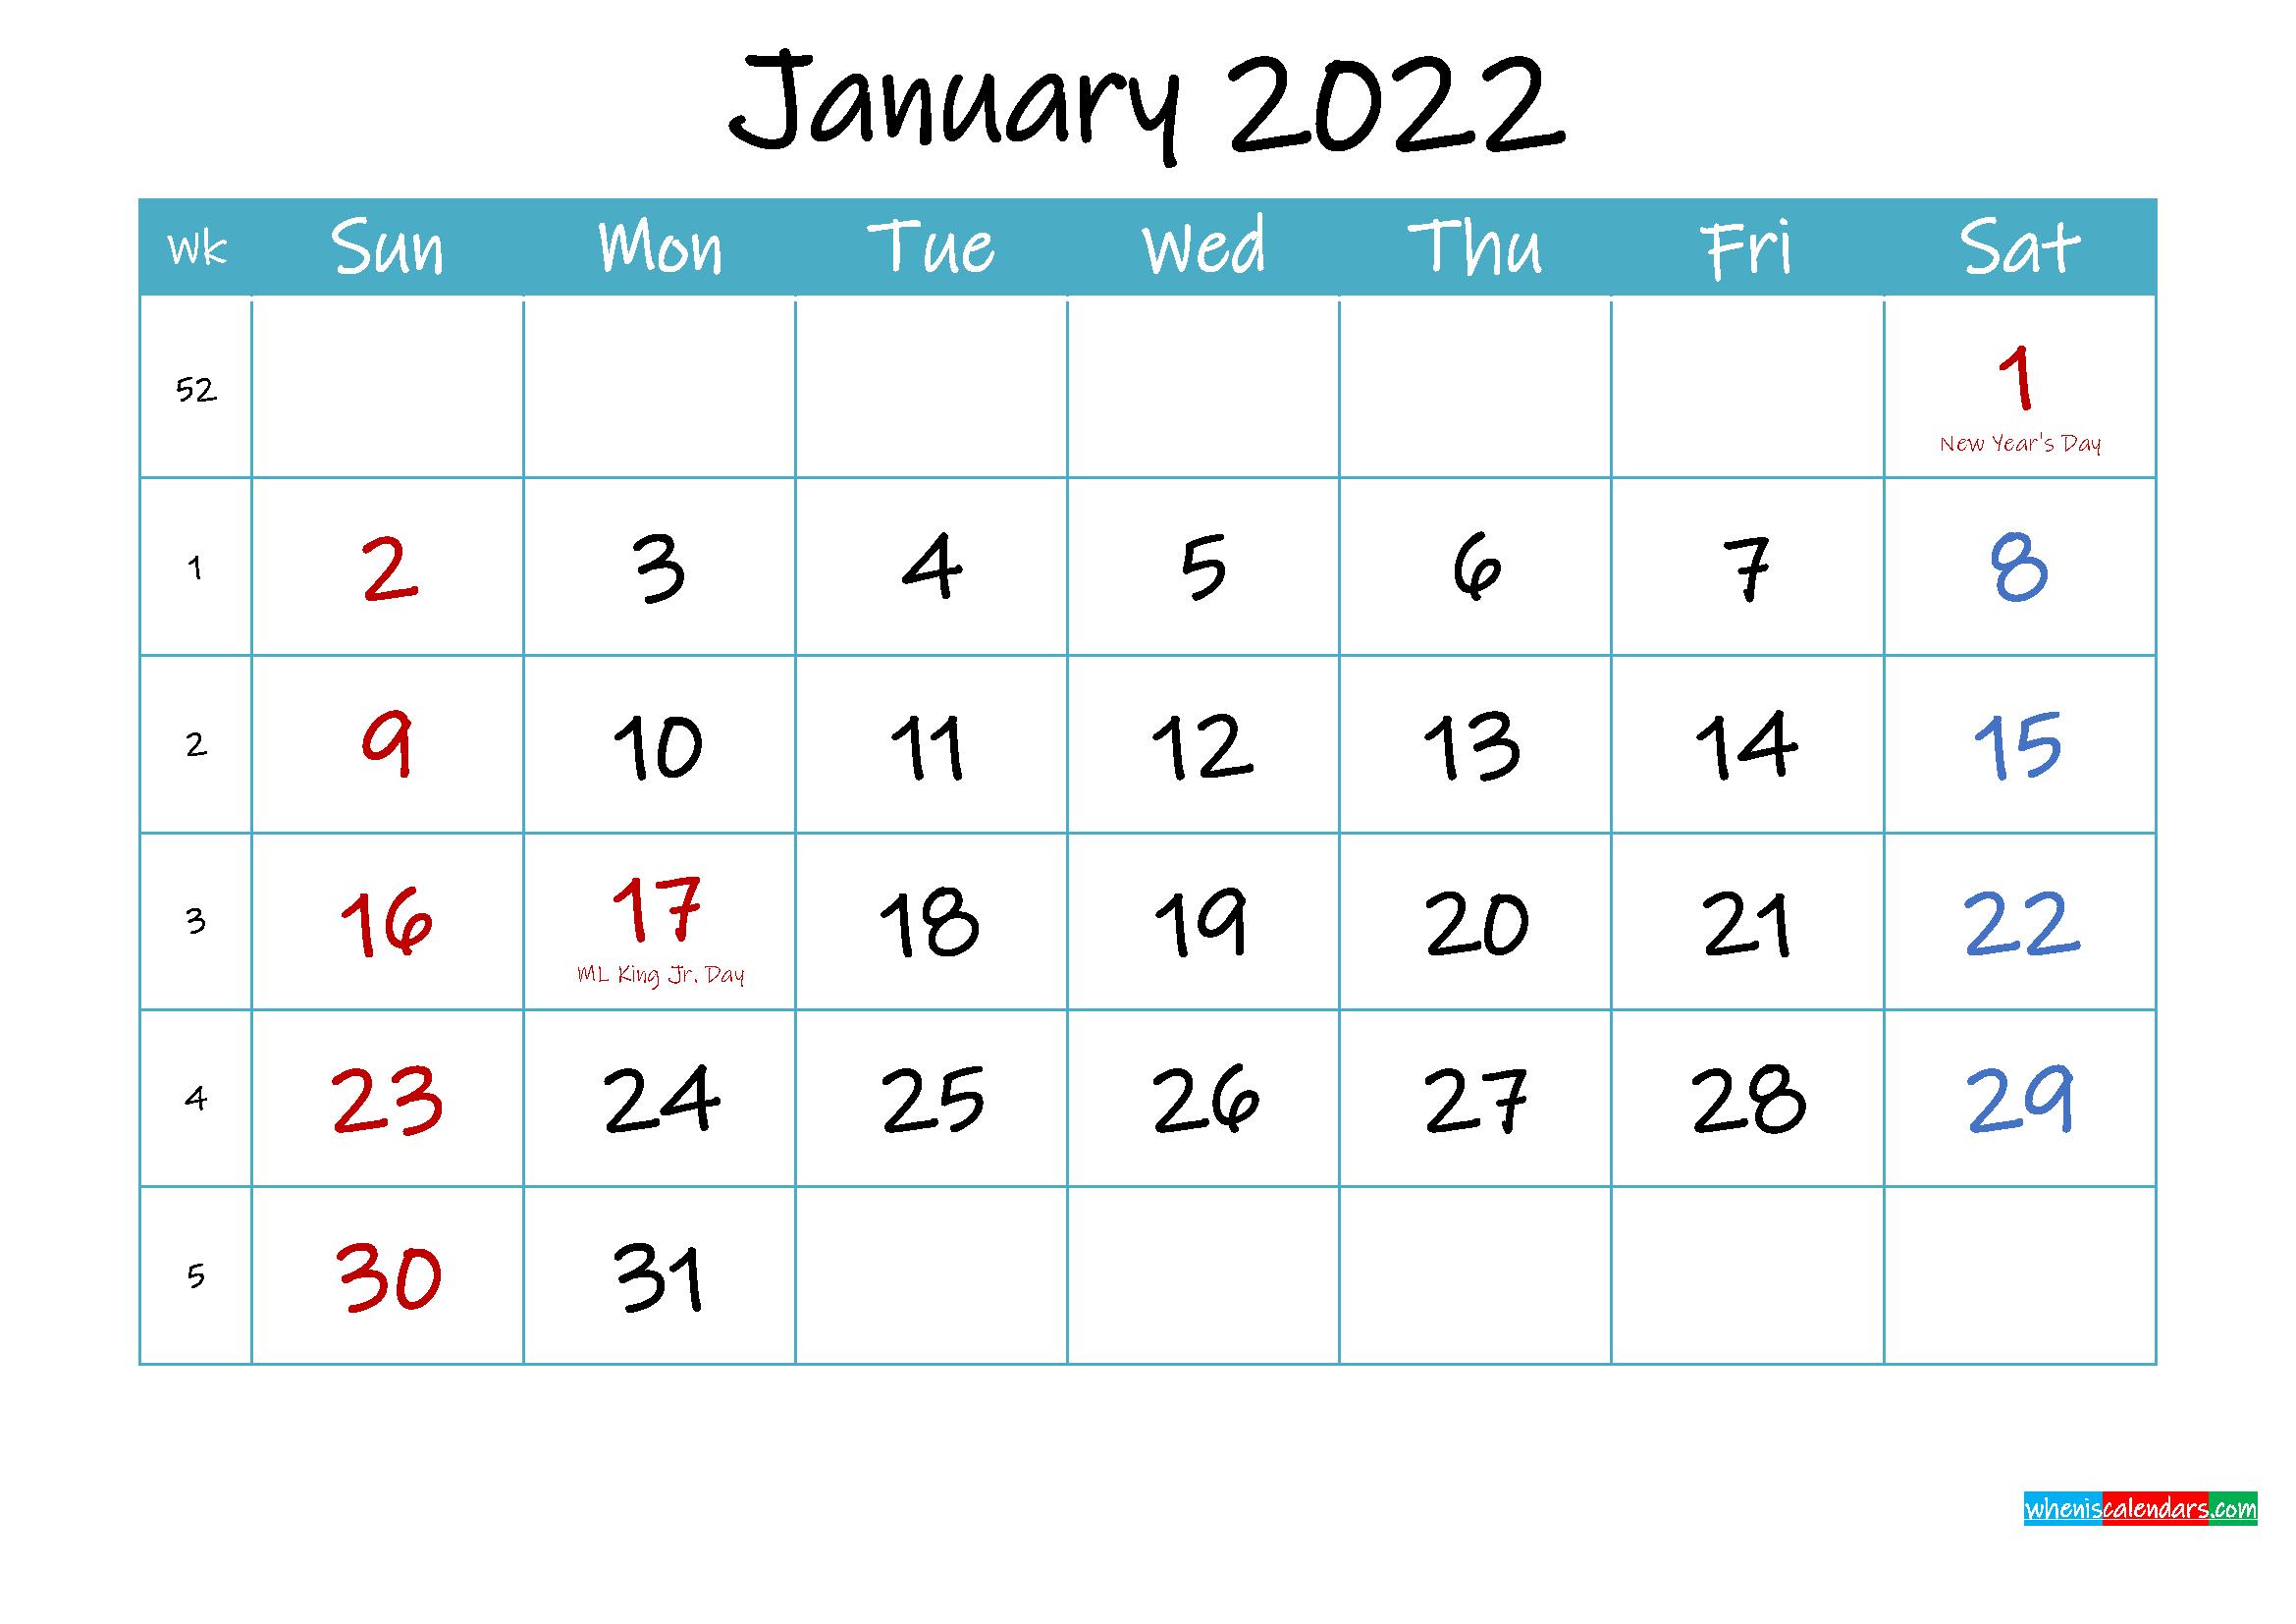 Printable January 2022 Calendar Pdf - Template Ink22M61 for January 2022 Calendar Half Page Print